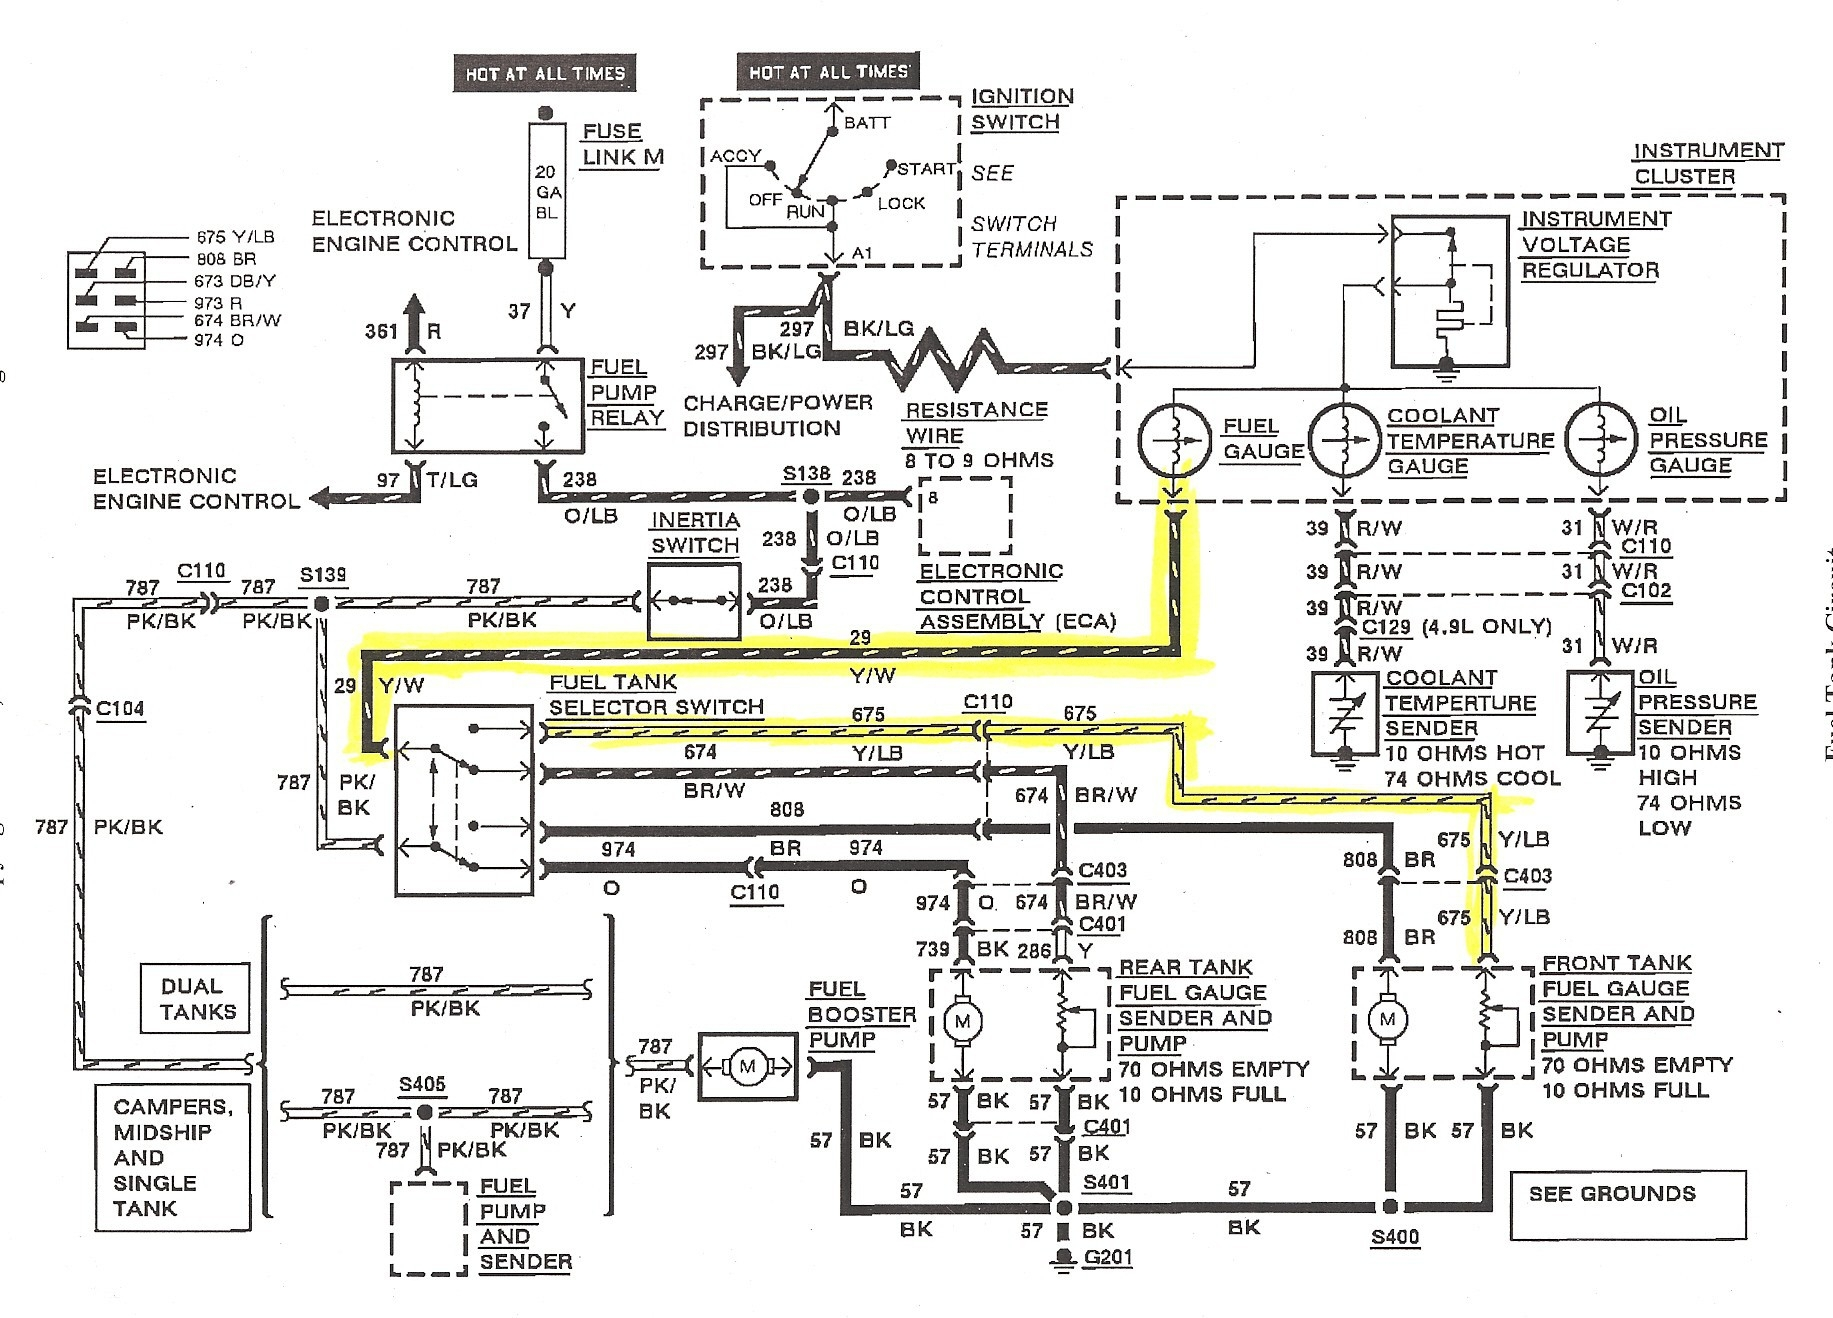 Hk42fz009 Wiring Diagram